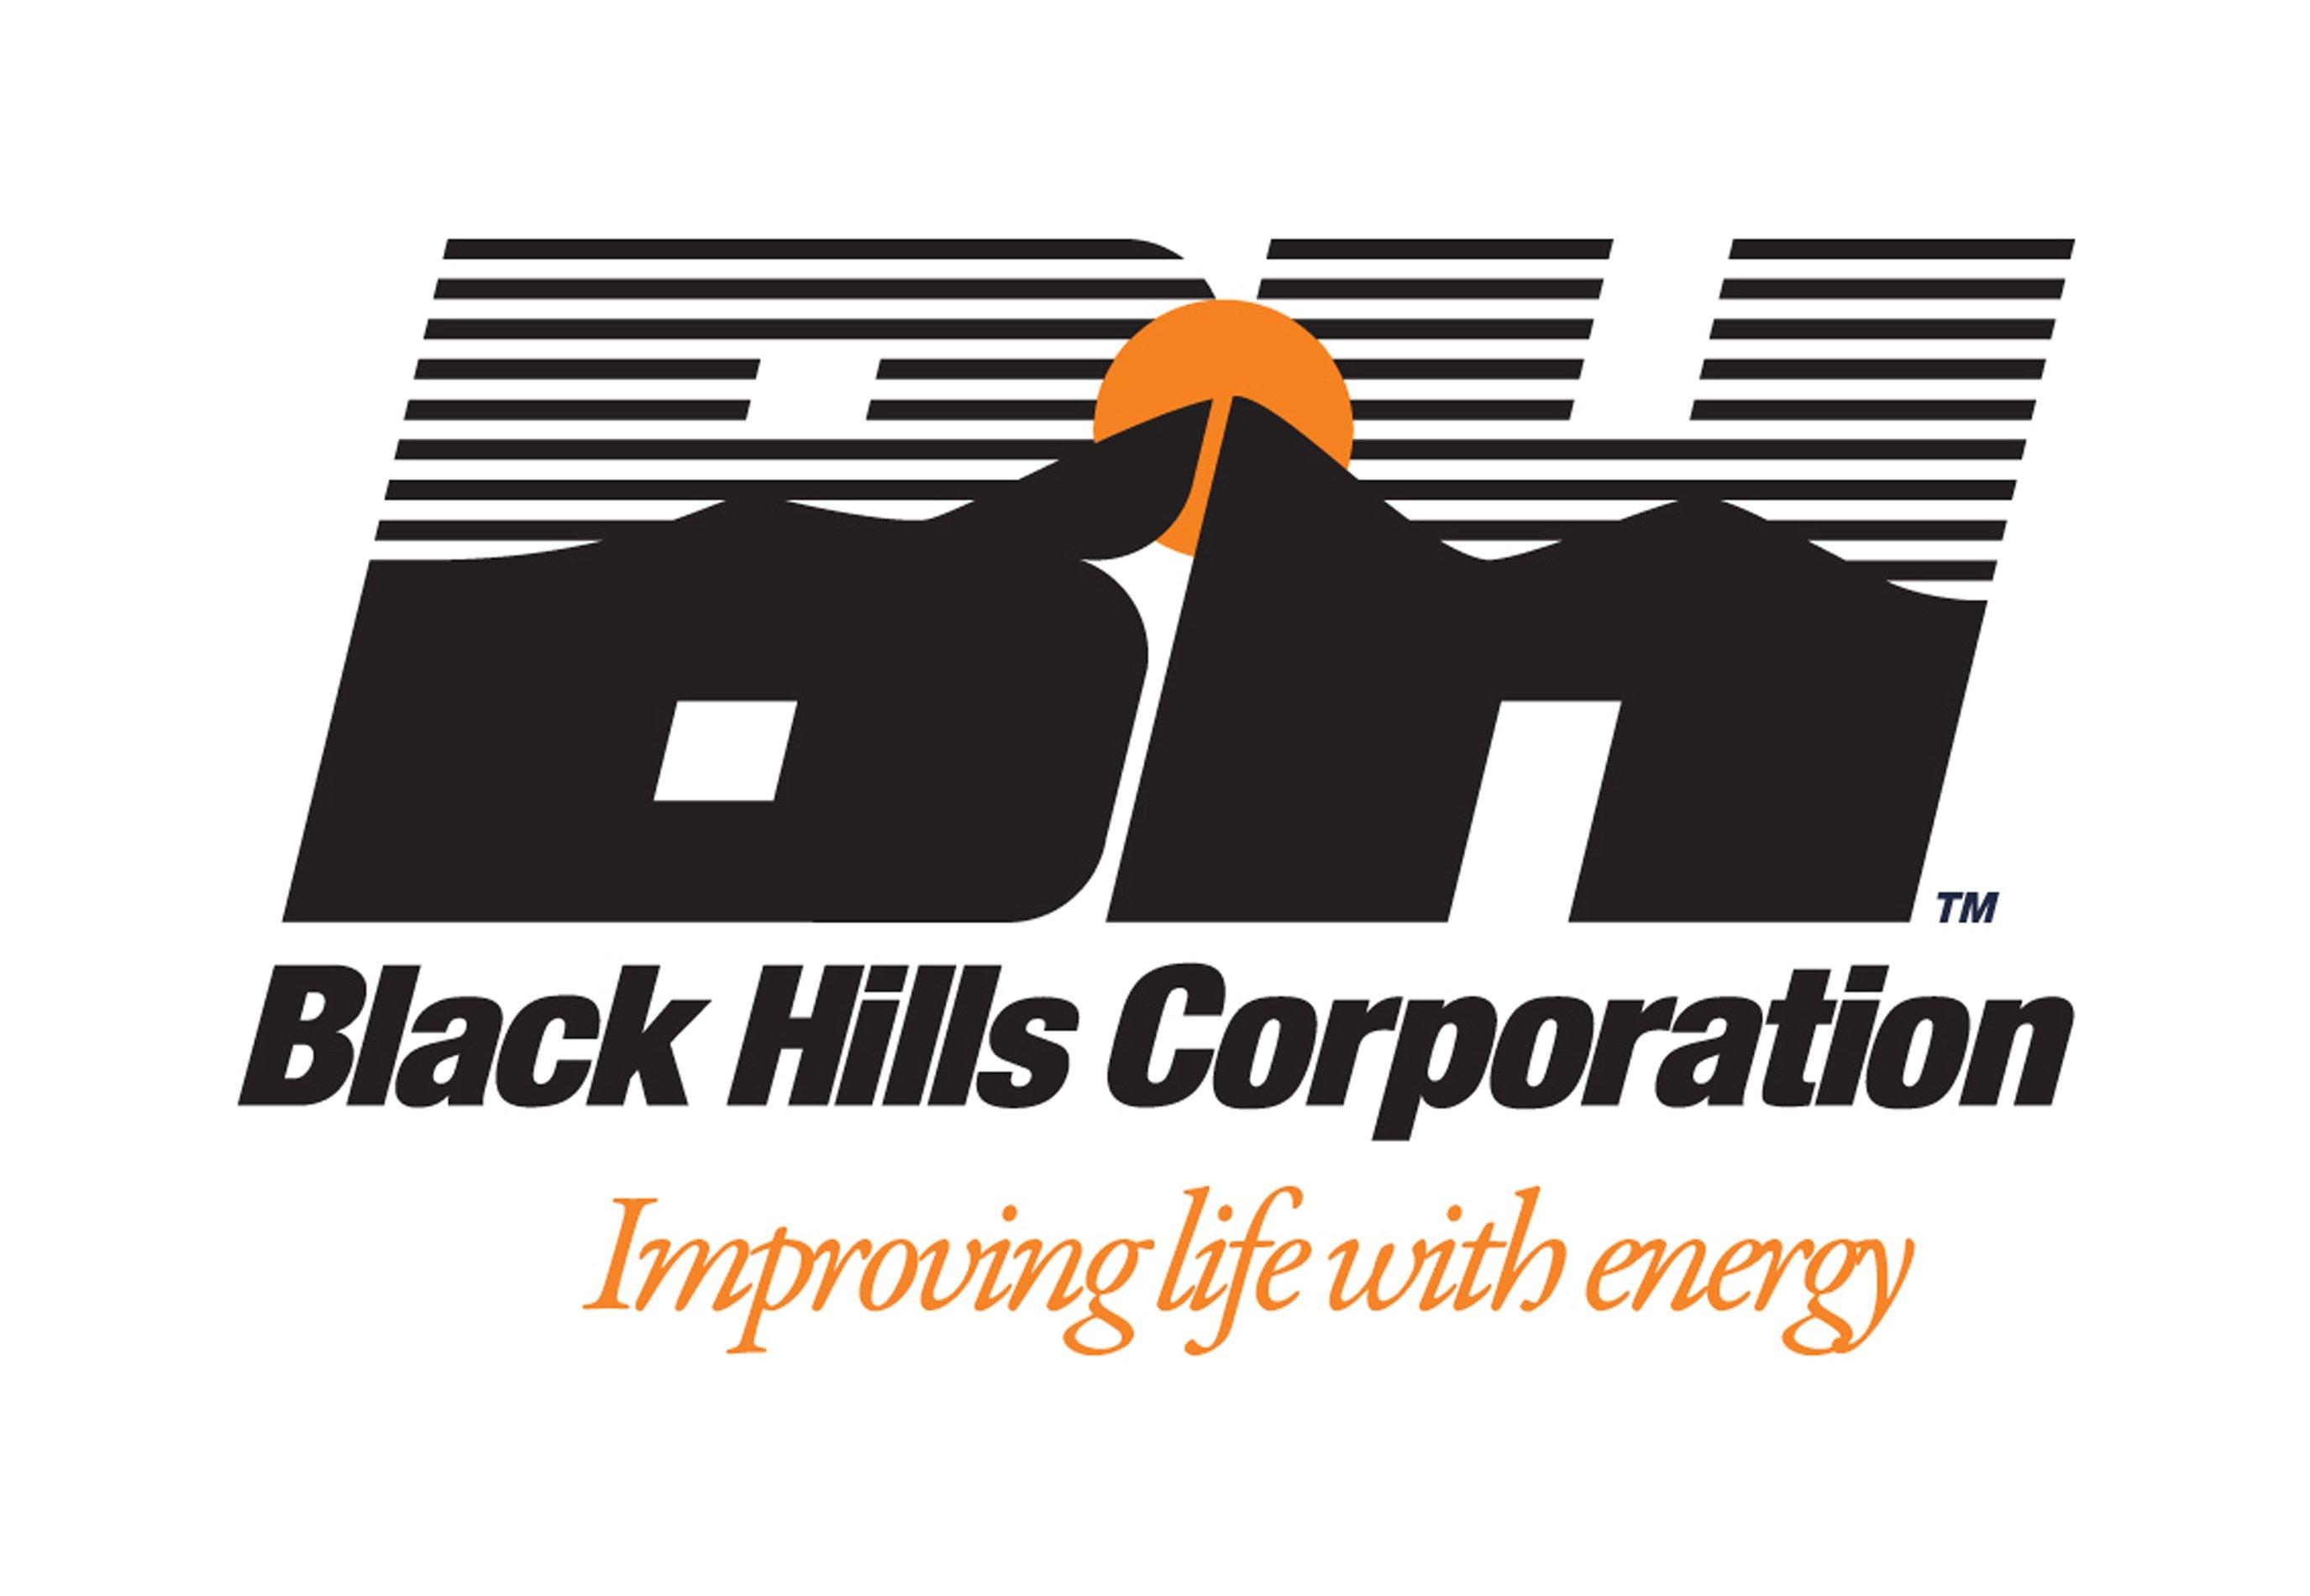 Black Hills Corp logo